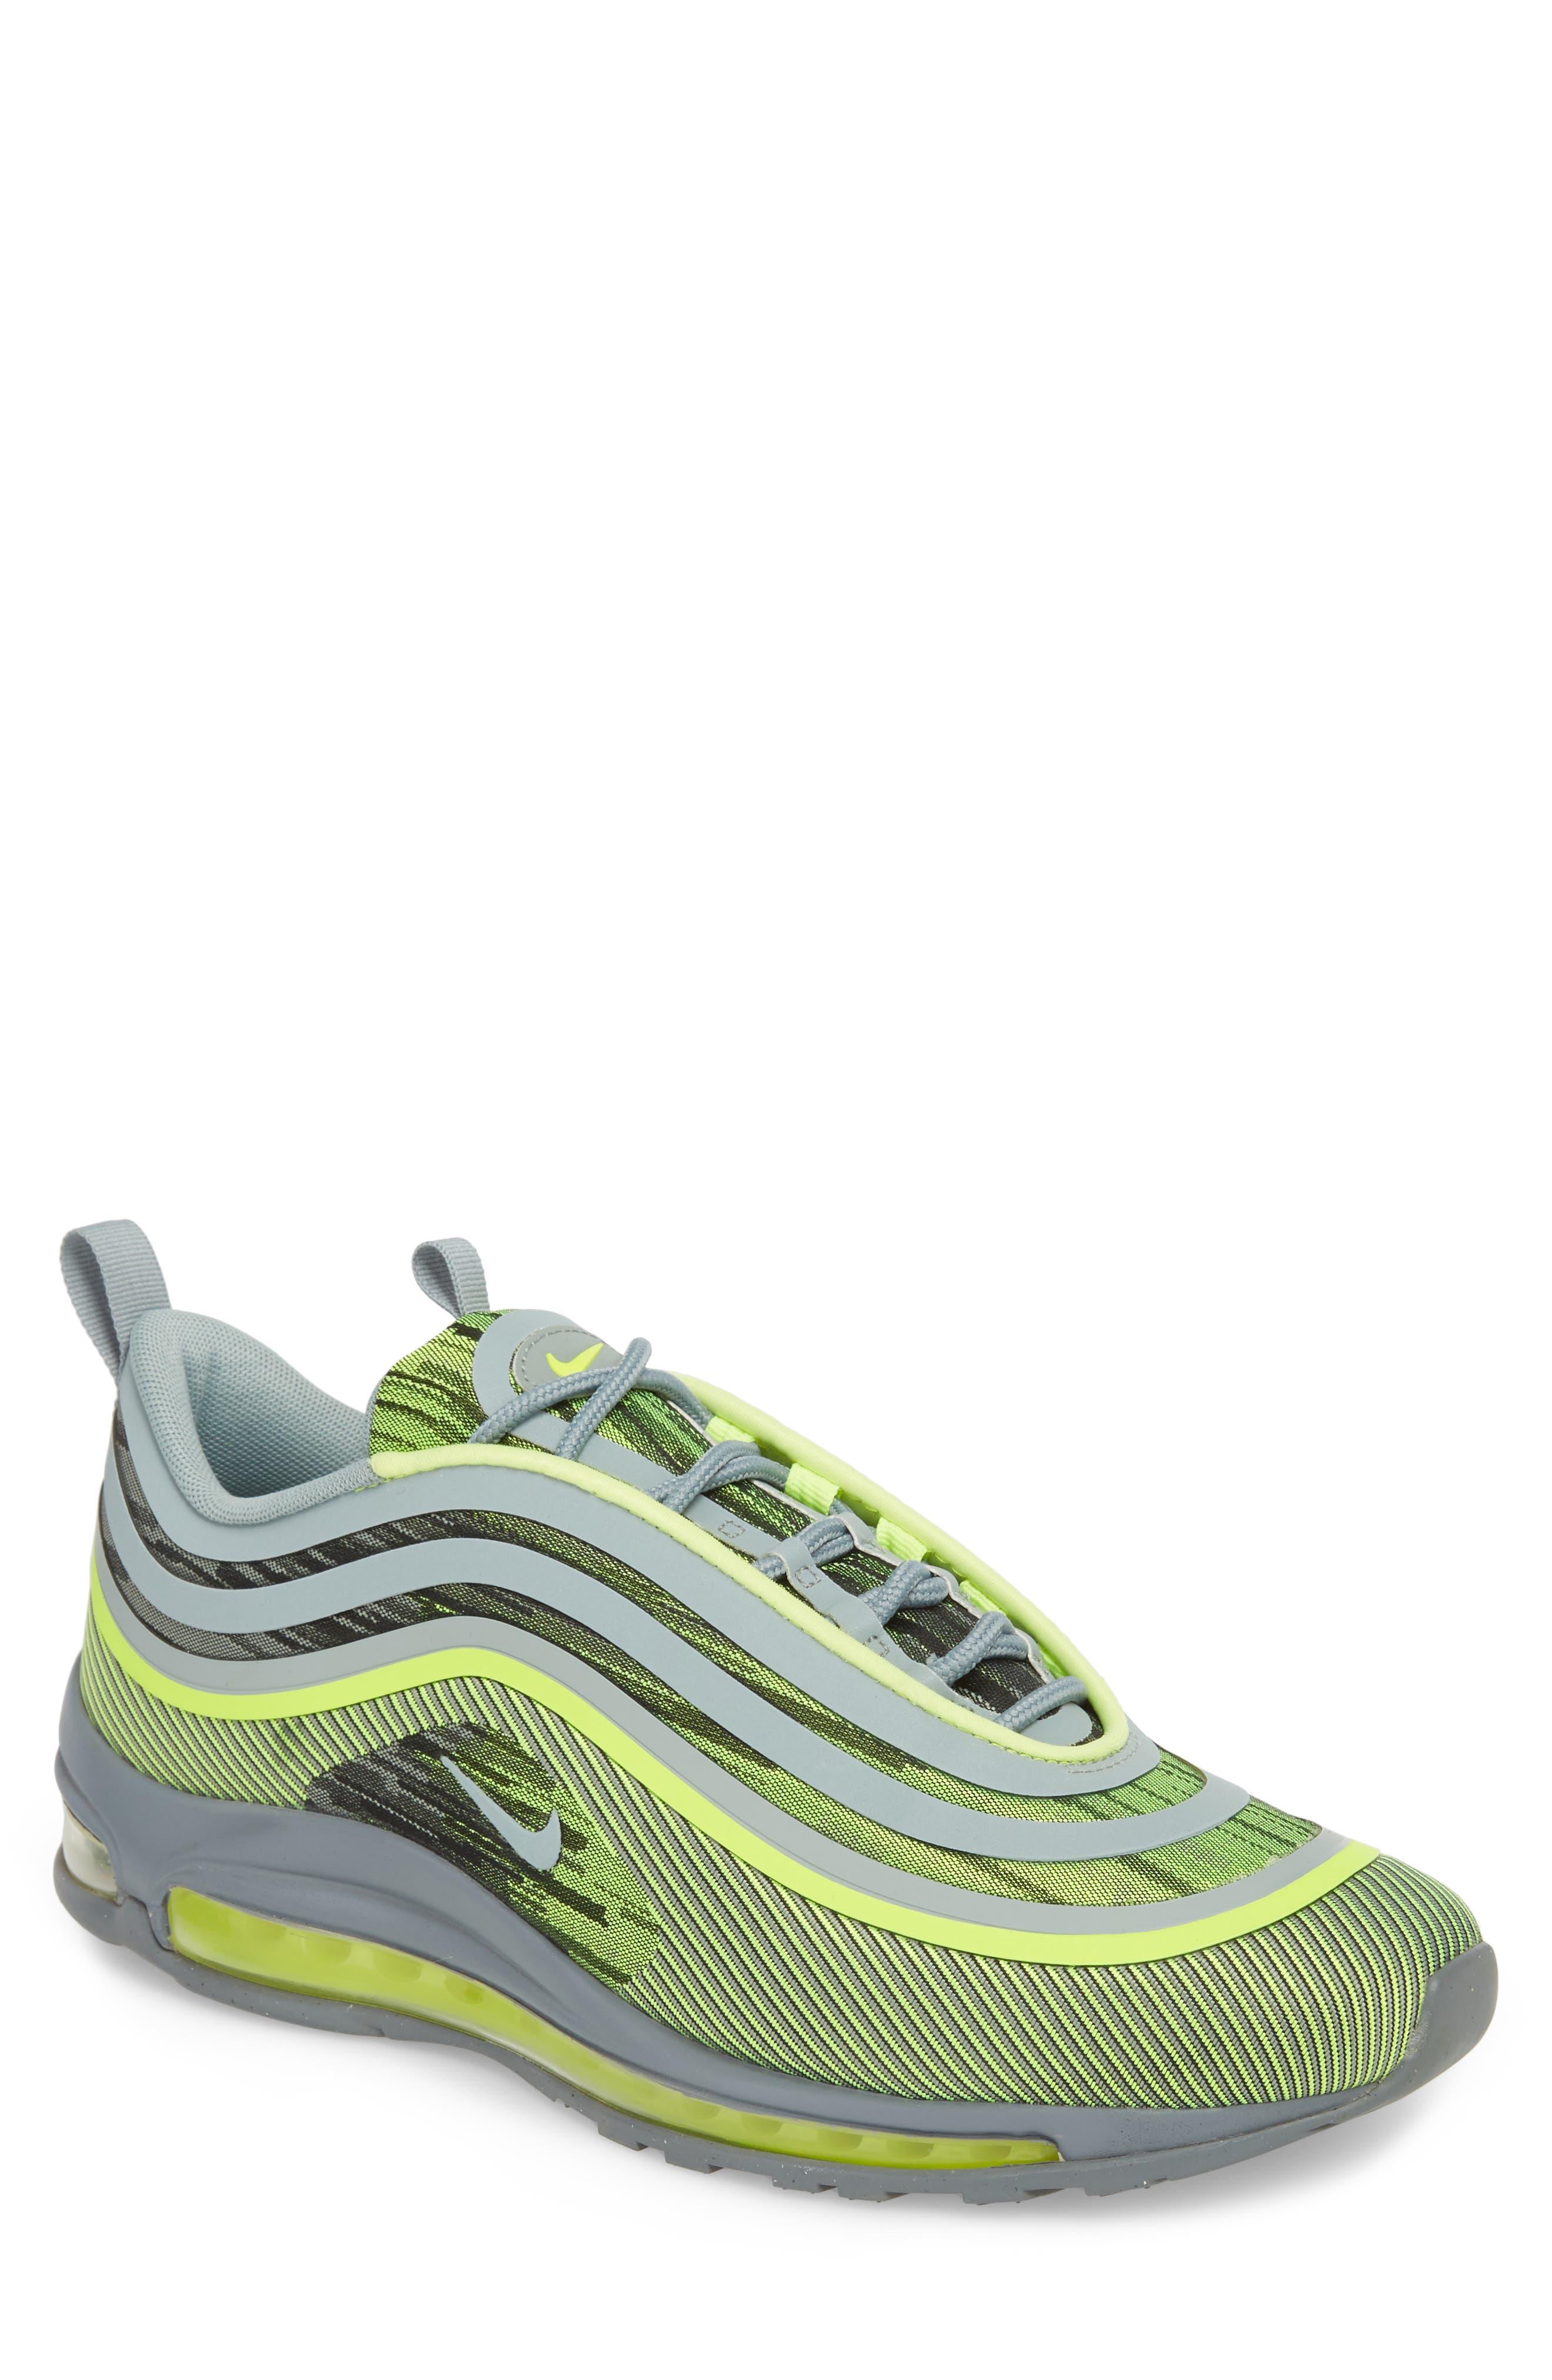 Air Max 97 Ultra '17 Sneaker,                             Main thumbnail 1, color,                             Volt/ Mica Green/ Cool Grey